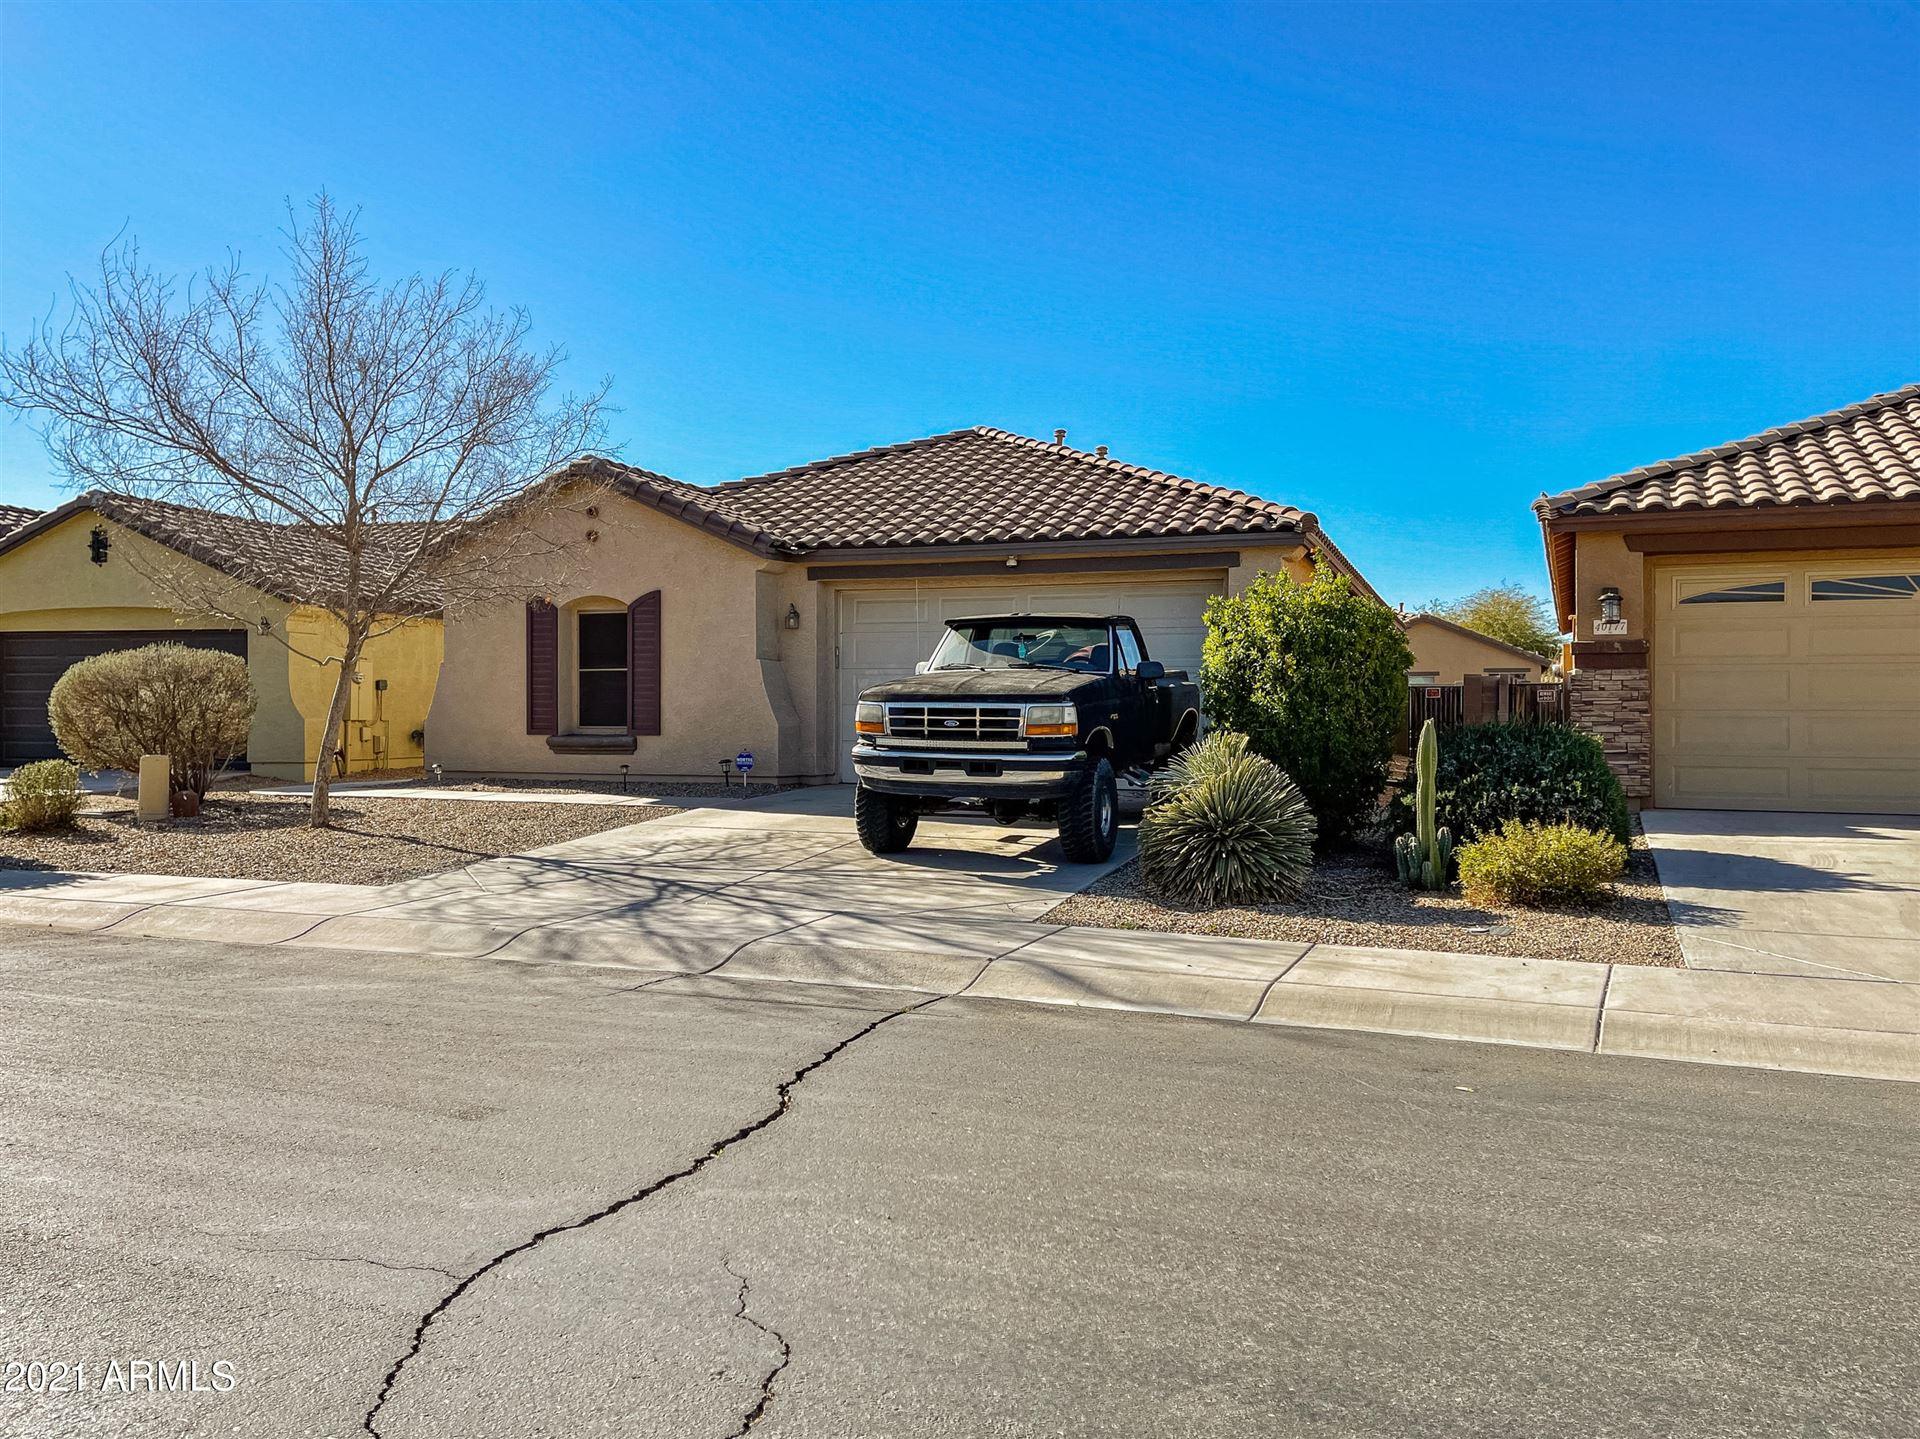 Photo of 40165 W TAMARA Lane, Maricopa, AZ 85138 (MLS # 6199672)